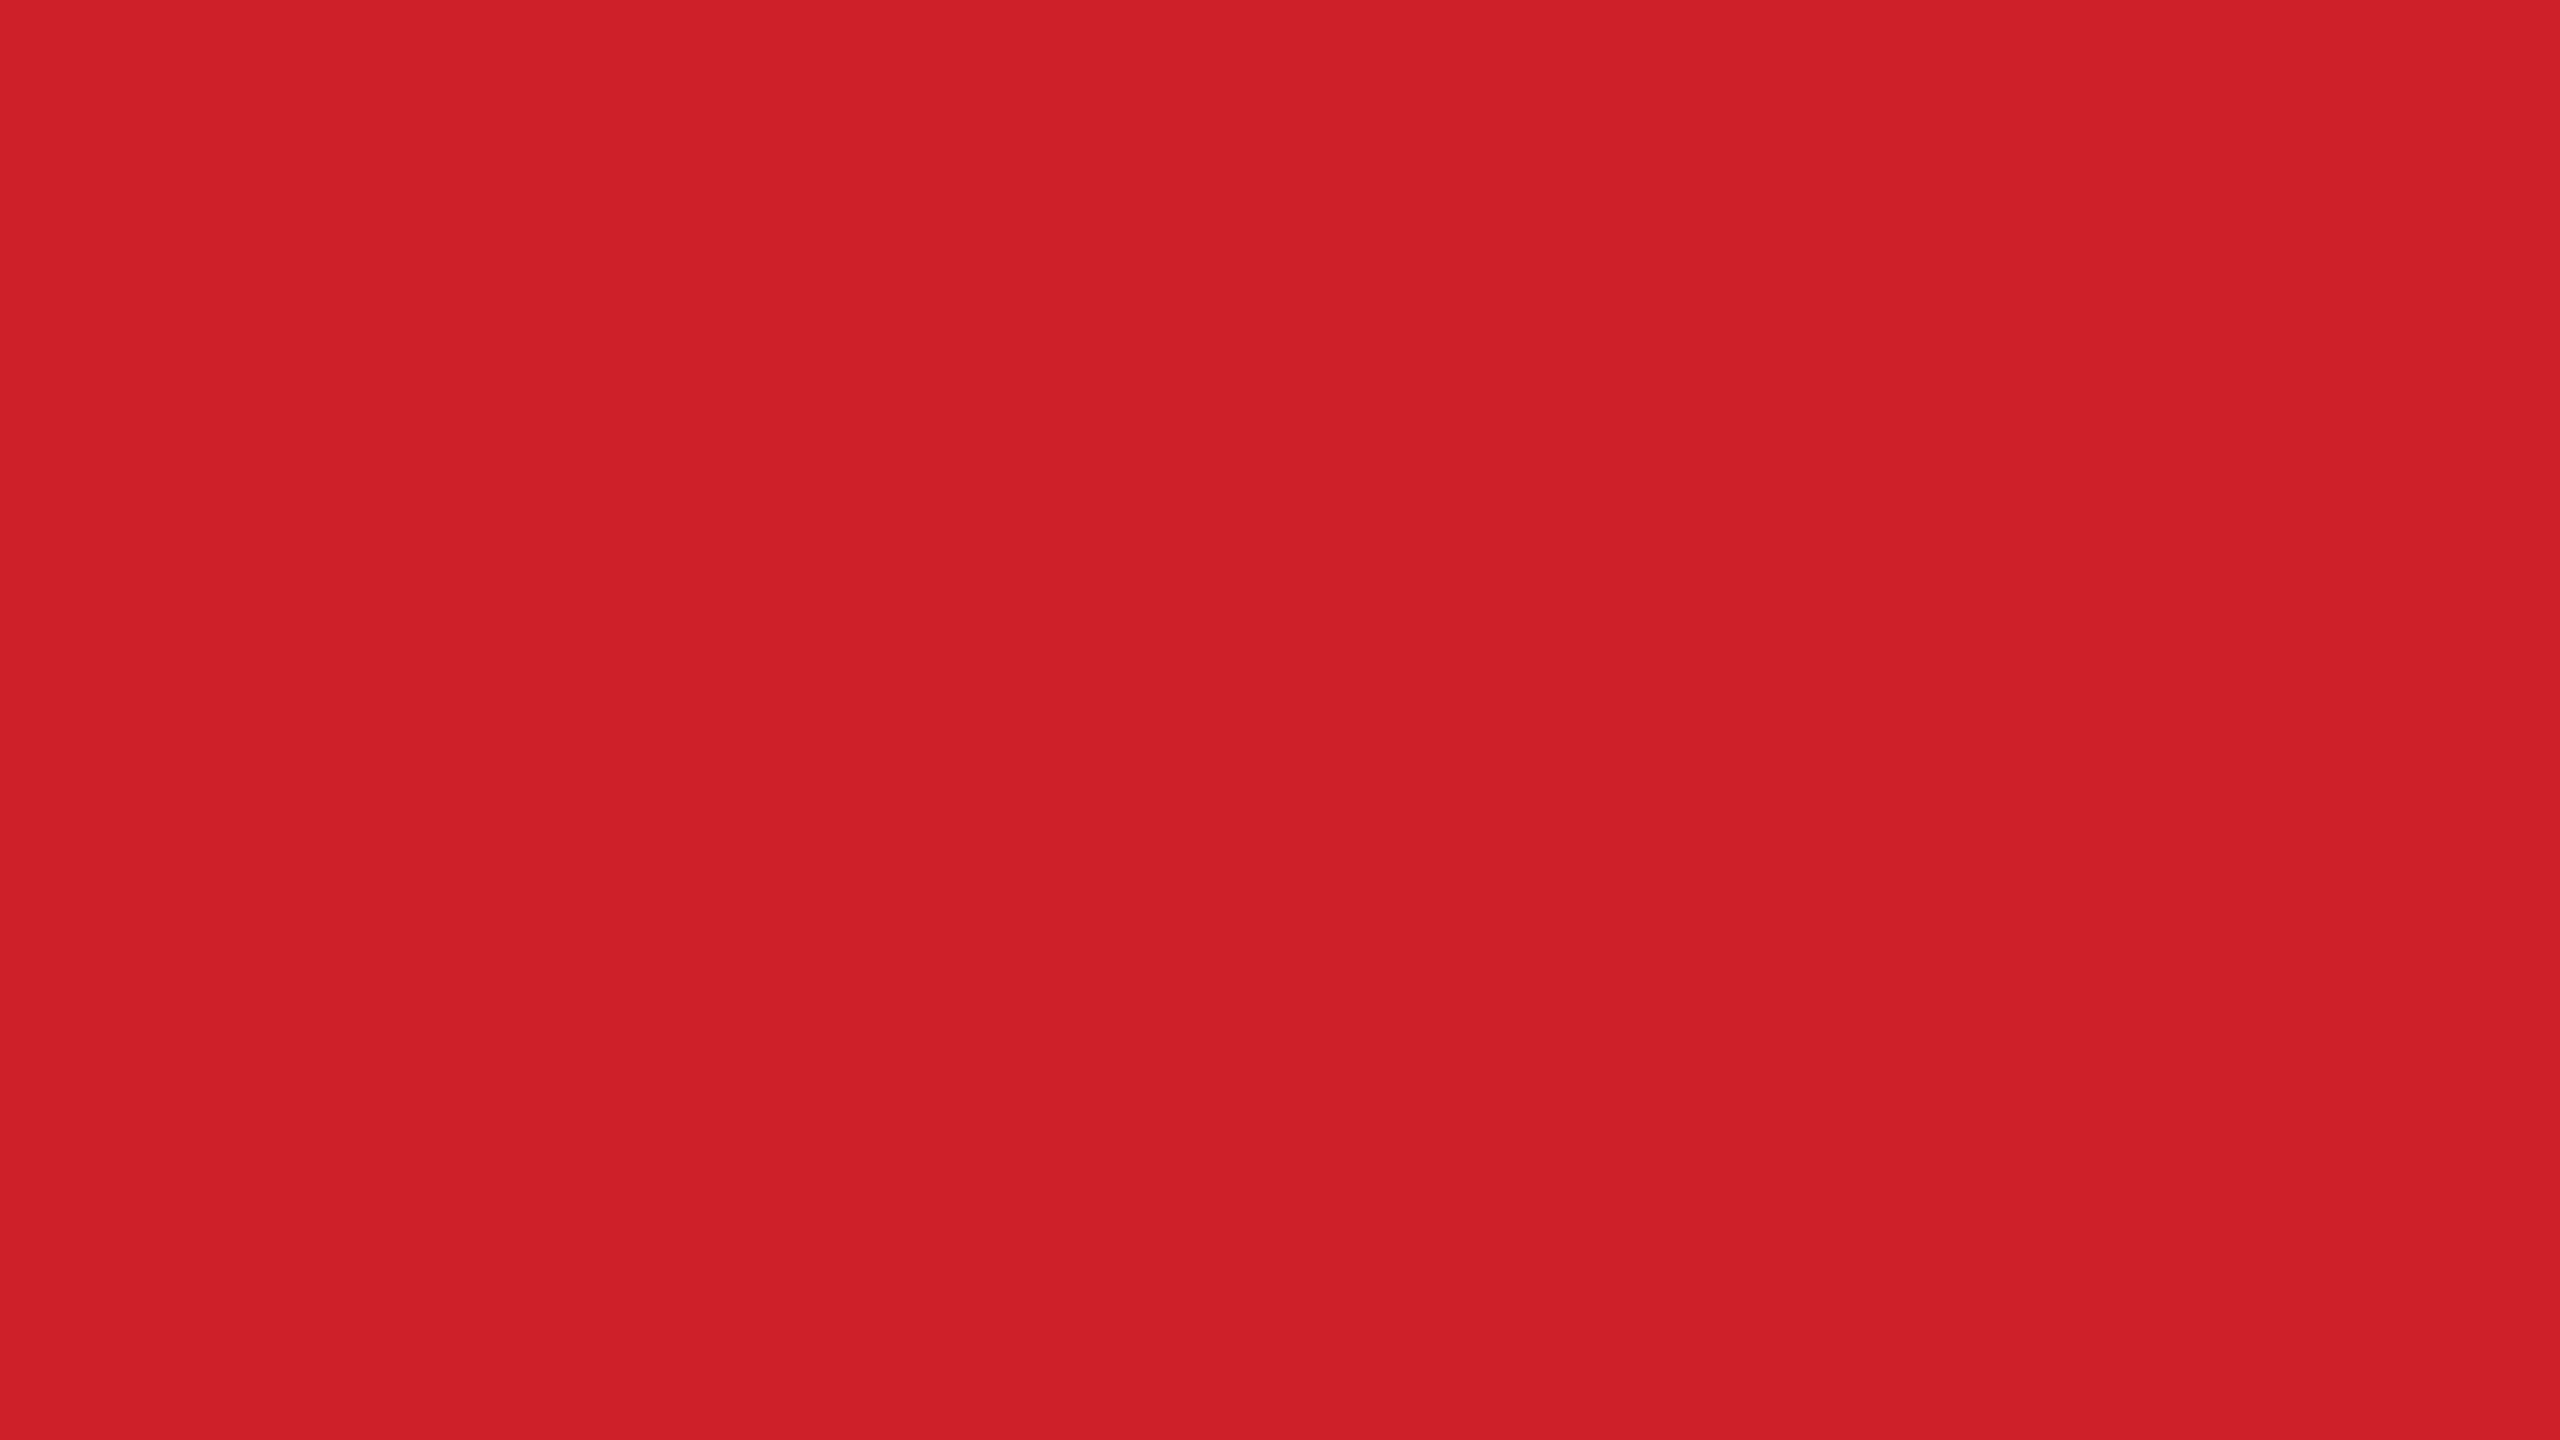 [78+] Red Color Wallpapers on WallpaperSafari